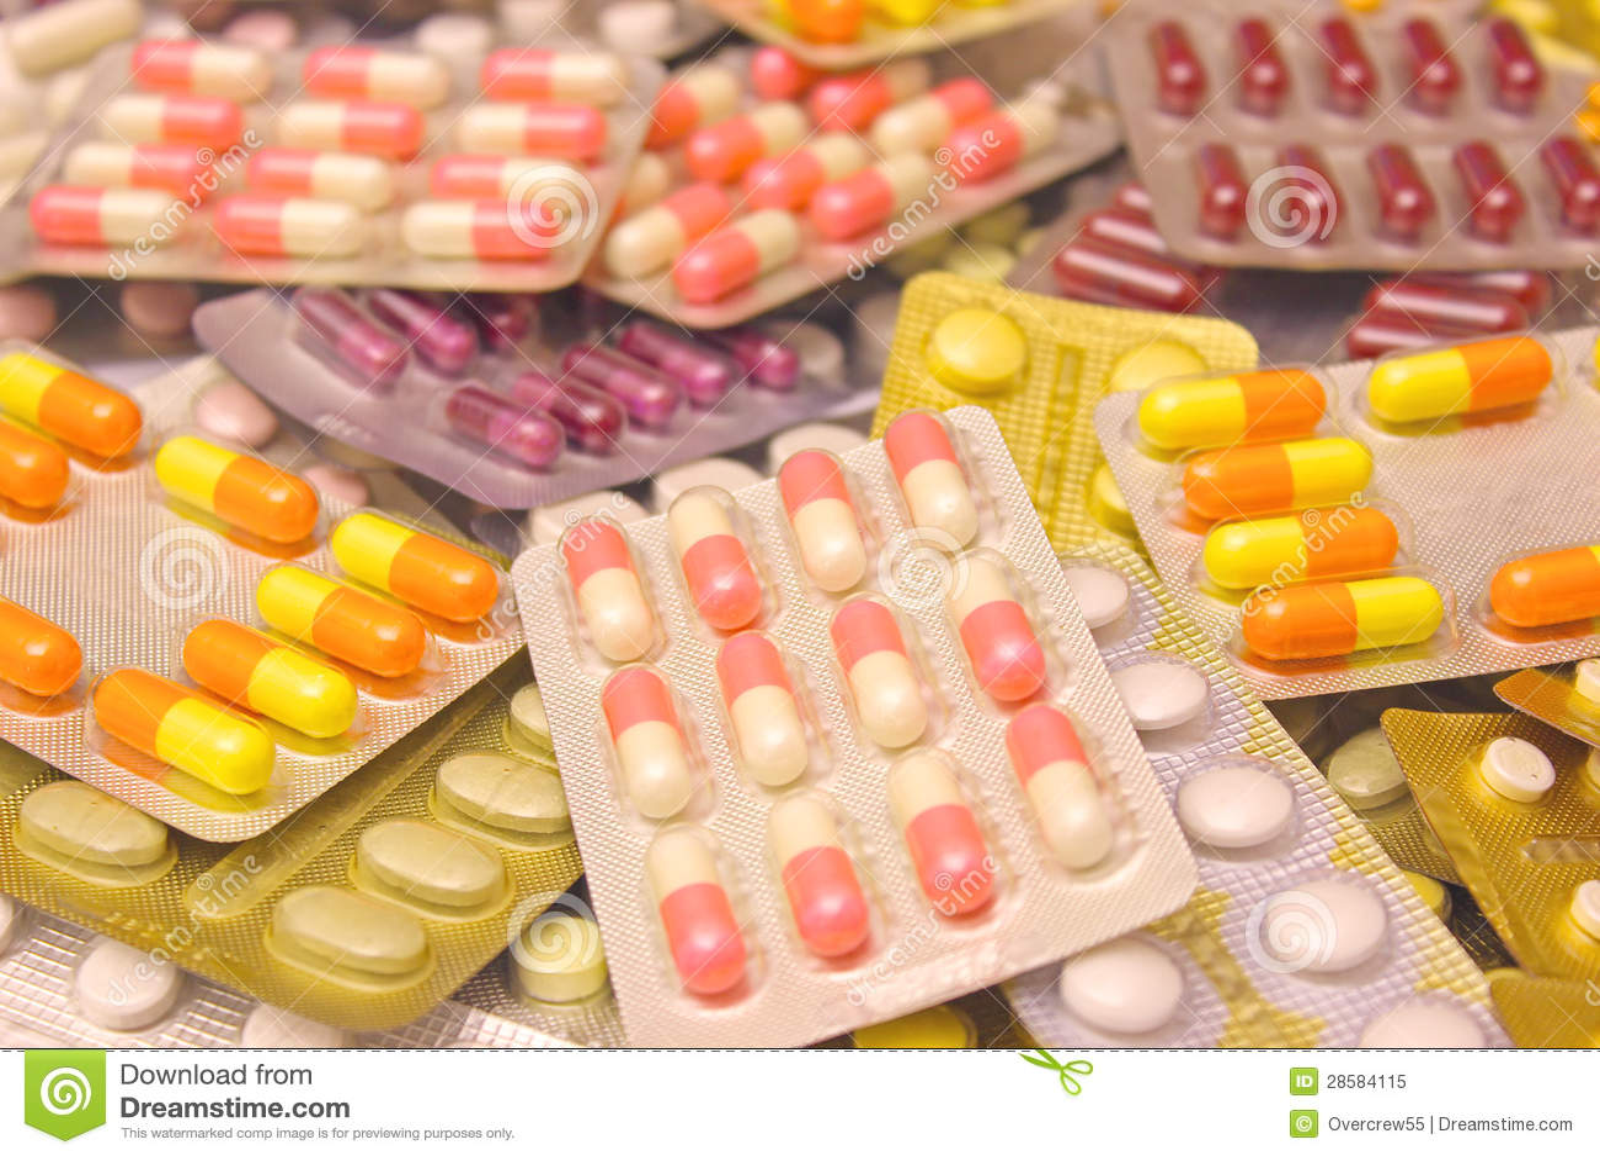 Quels bons sont les antibiotiques